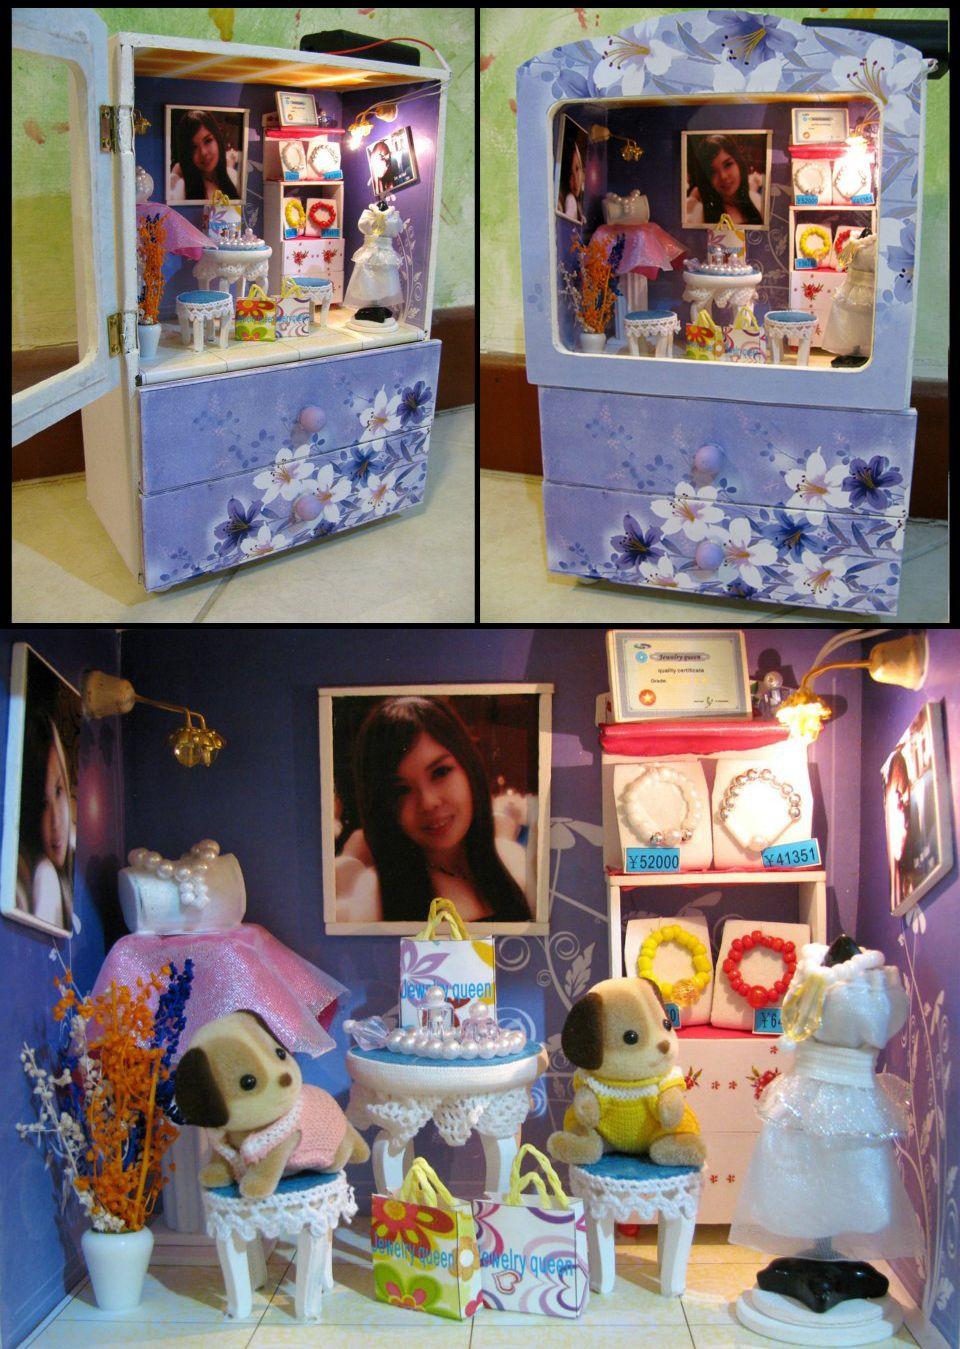 DIY Music Box - Fashionable Jewel Shop | Mailbox design ...